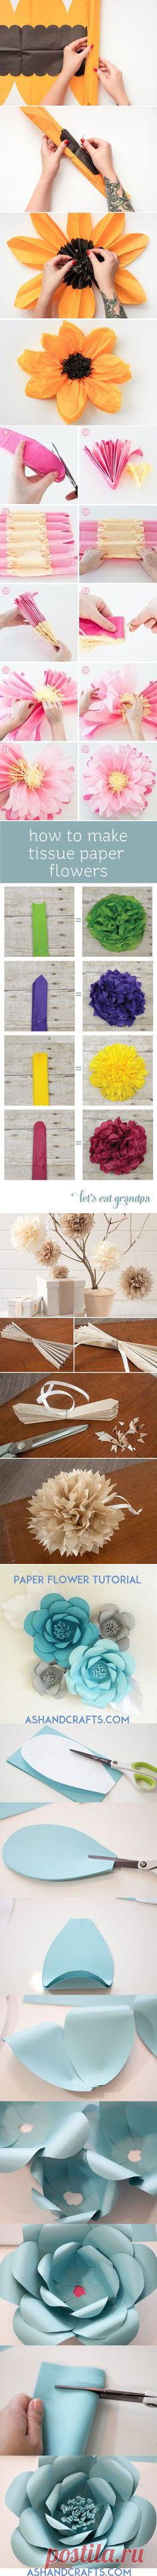 Tissue Paper Pom-Pom Kit -Chrysanth Flowers